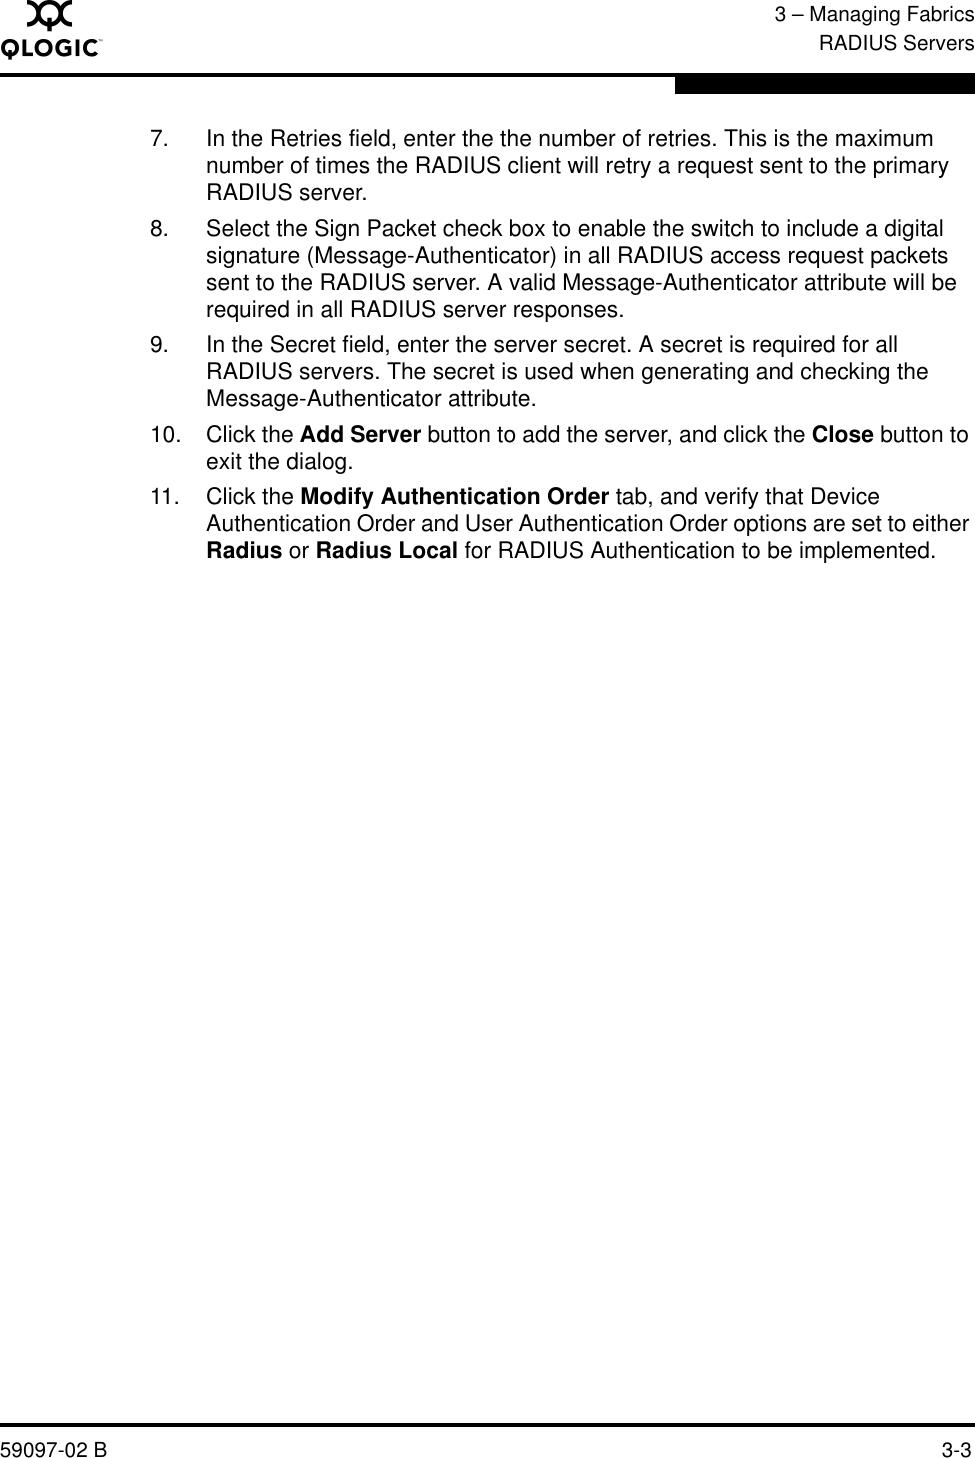 Q Logic 5600 Users Manual SANbox Series Switch Management